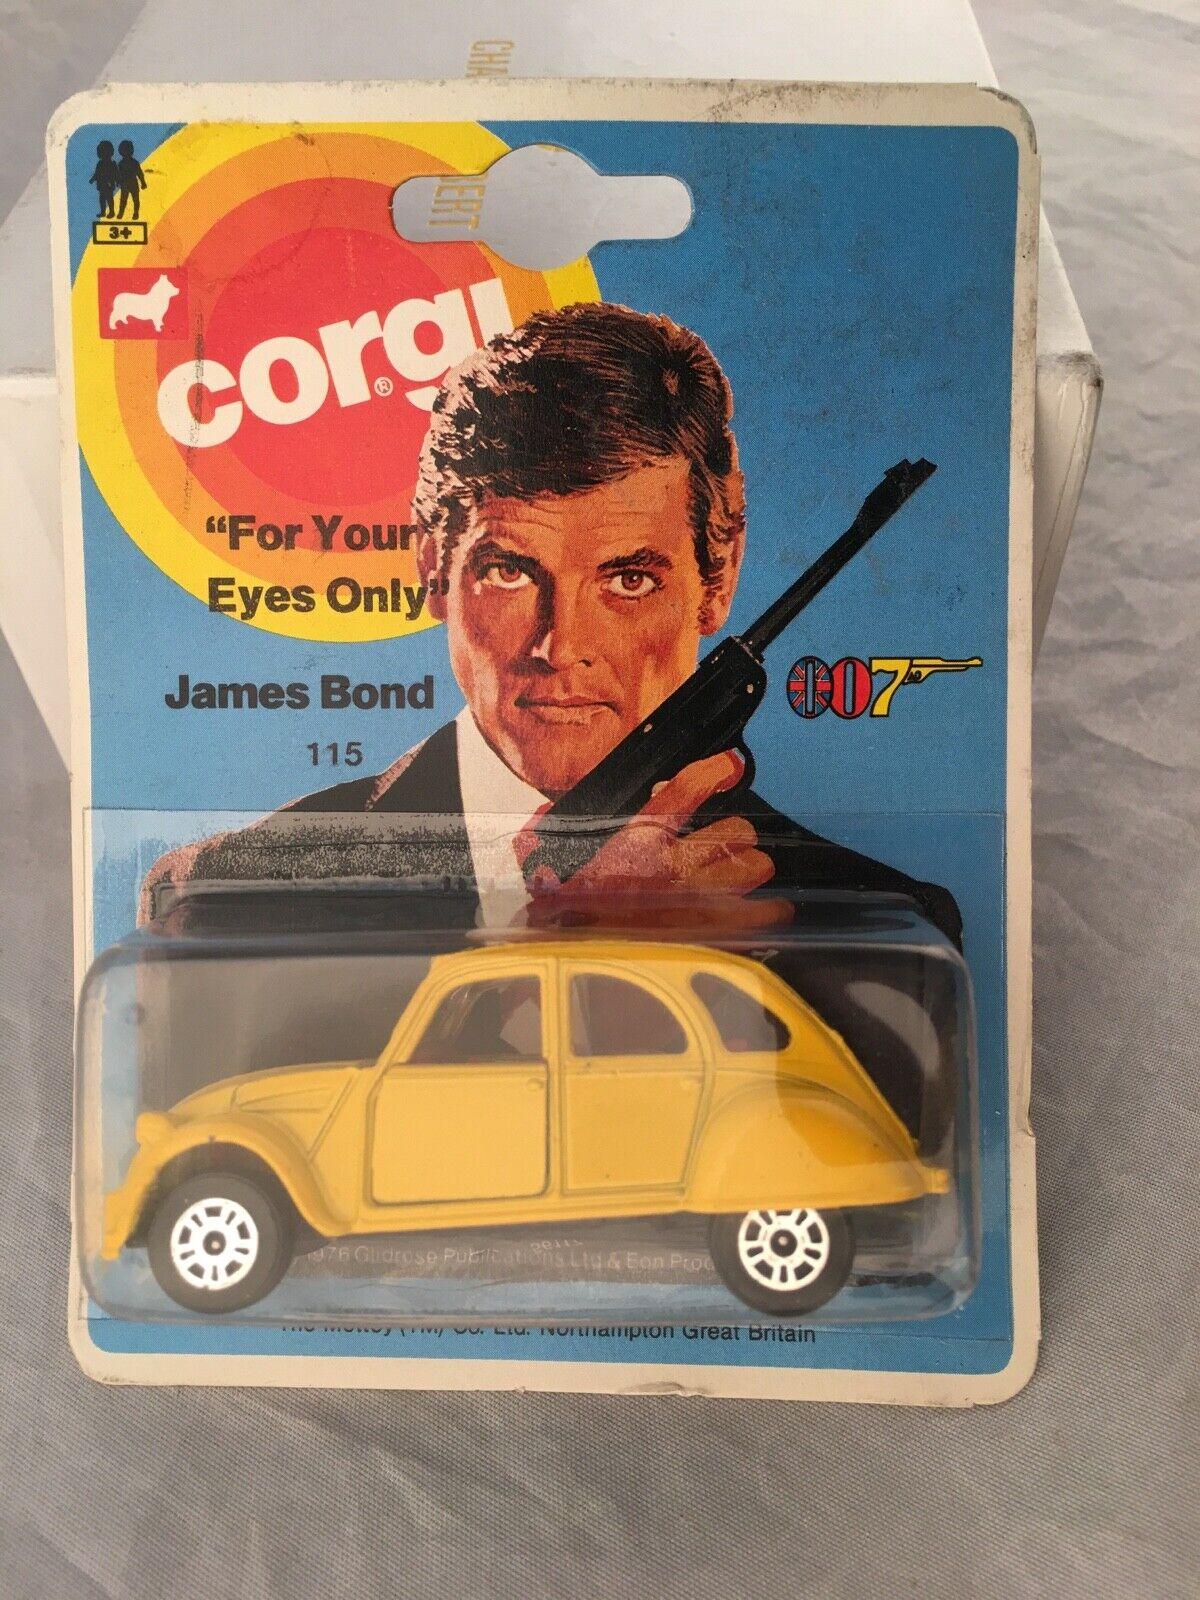 VINTAGE CORGI JAMES BOND 1976 CITROEN 2CV6-EXCELLENTE CARTE no price tag